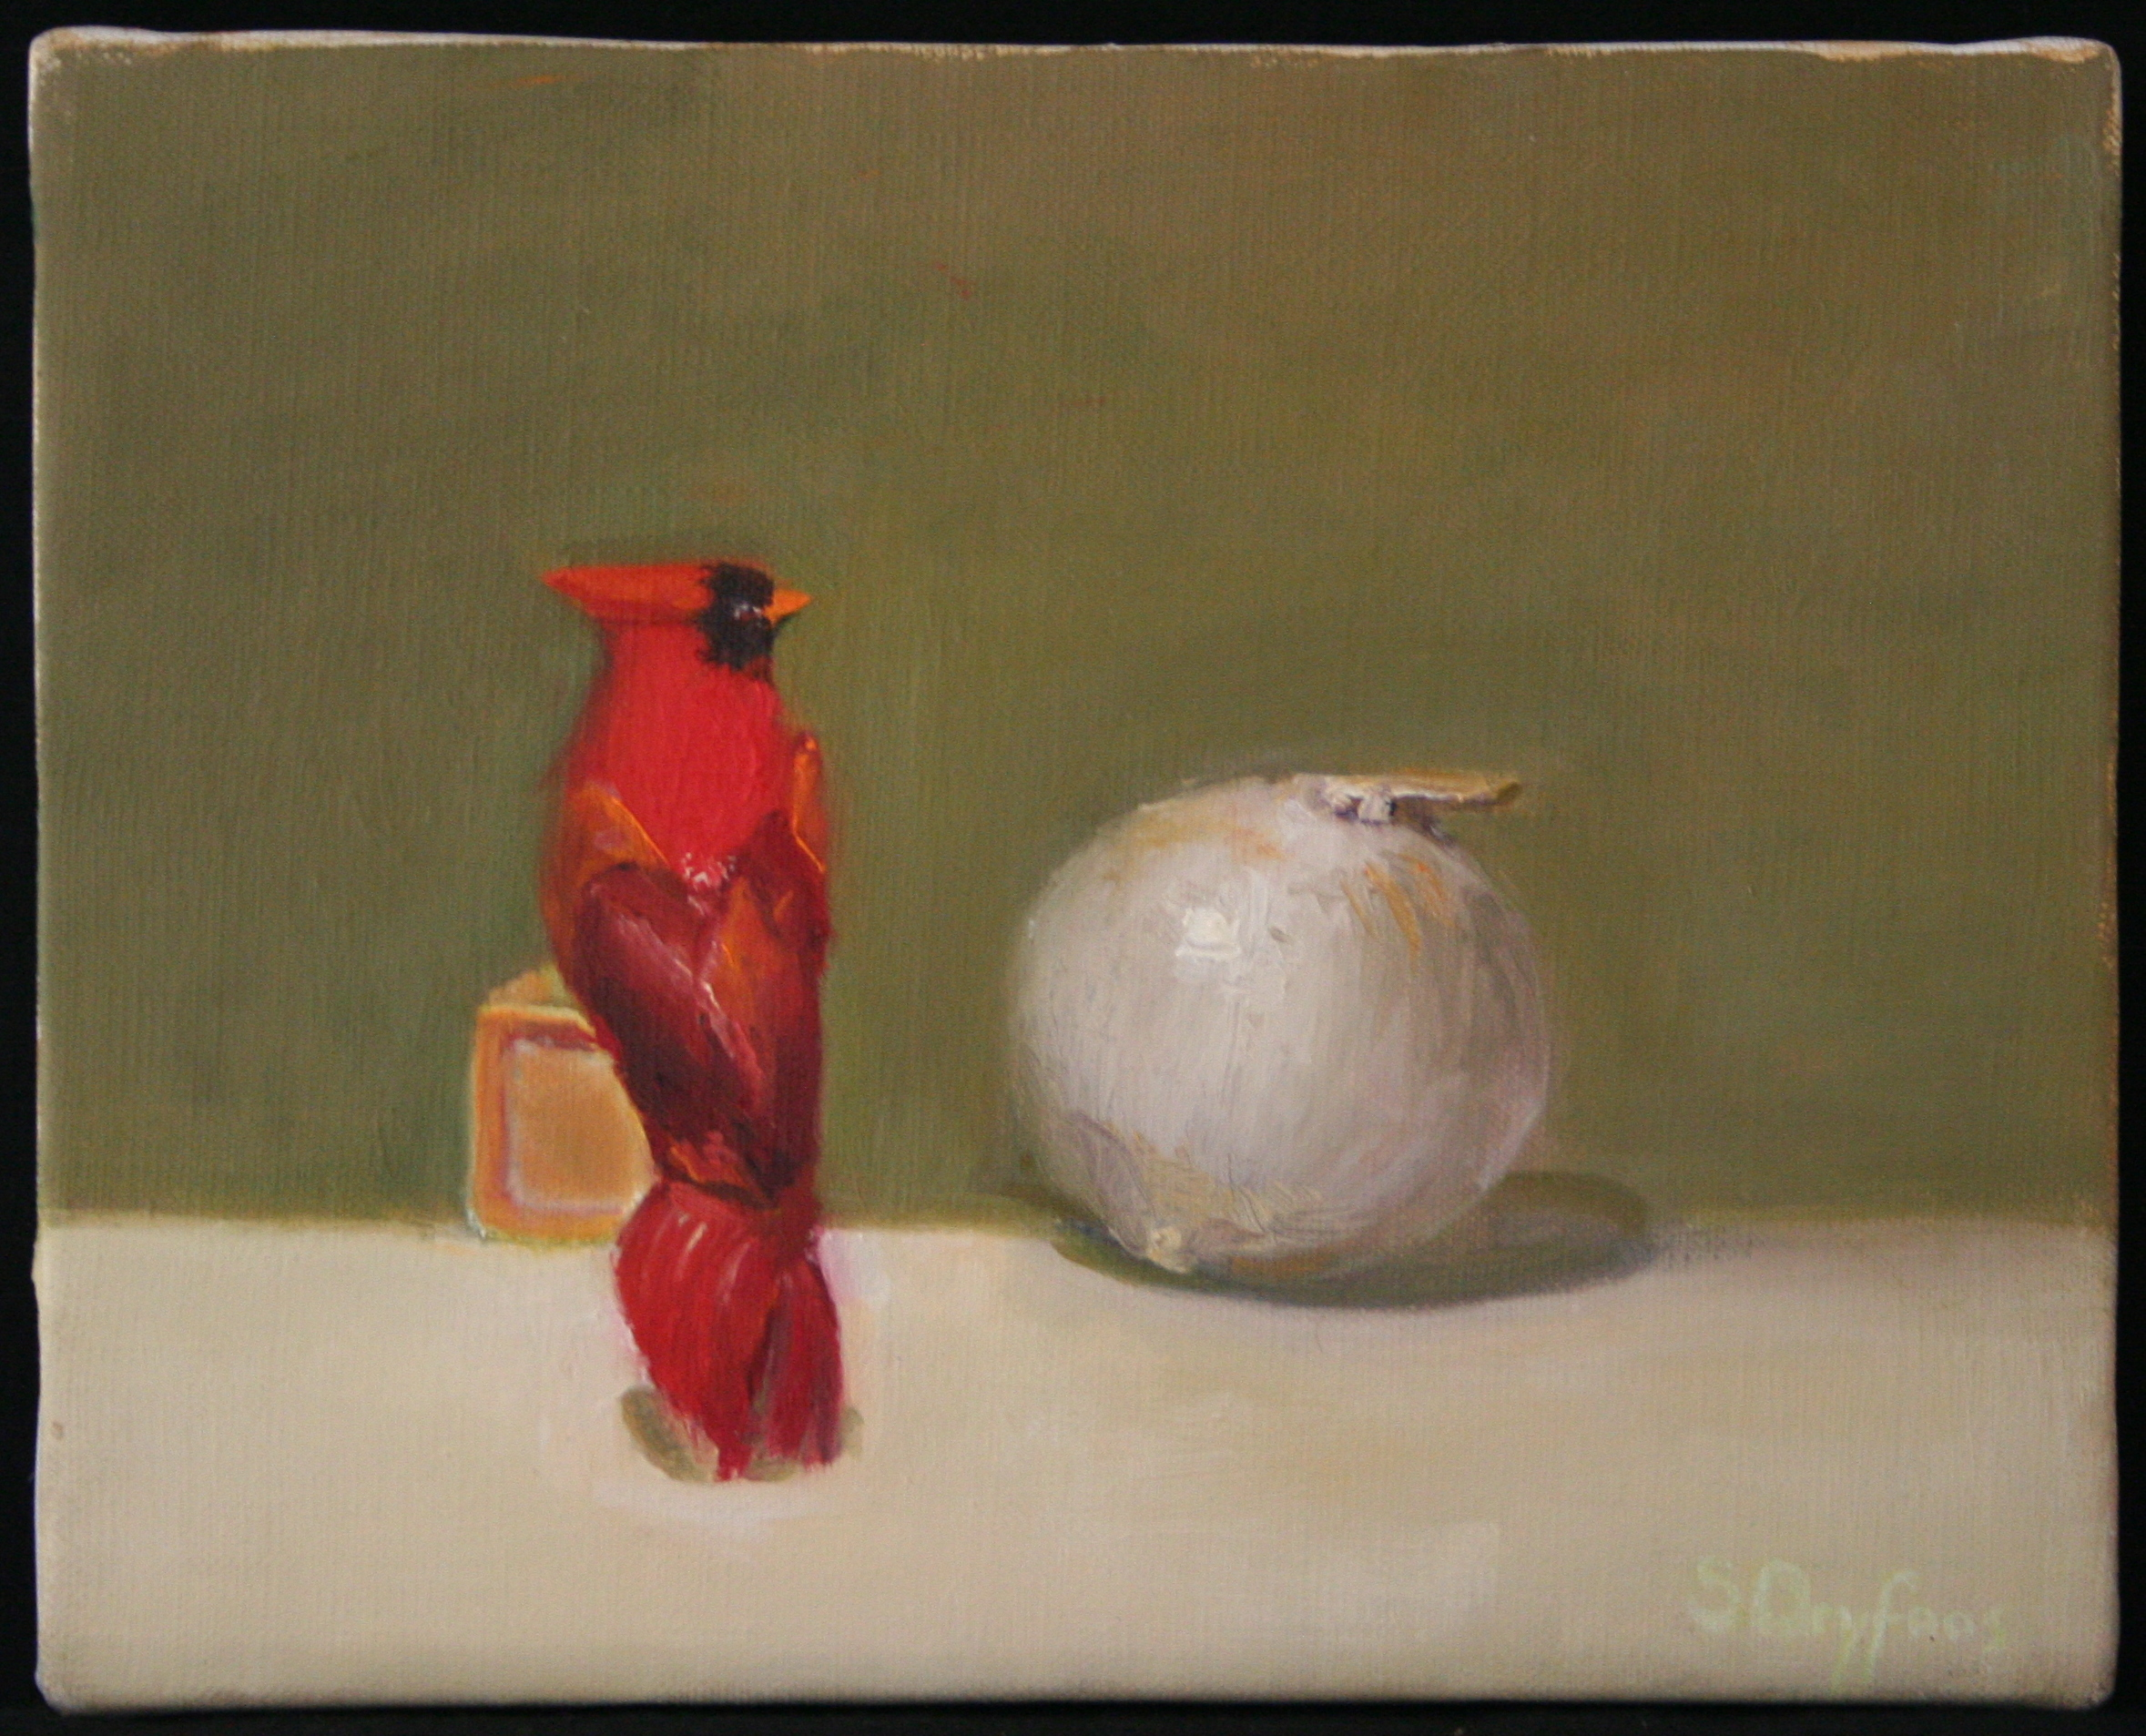 Cardinal and Onion